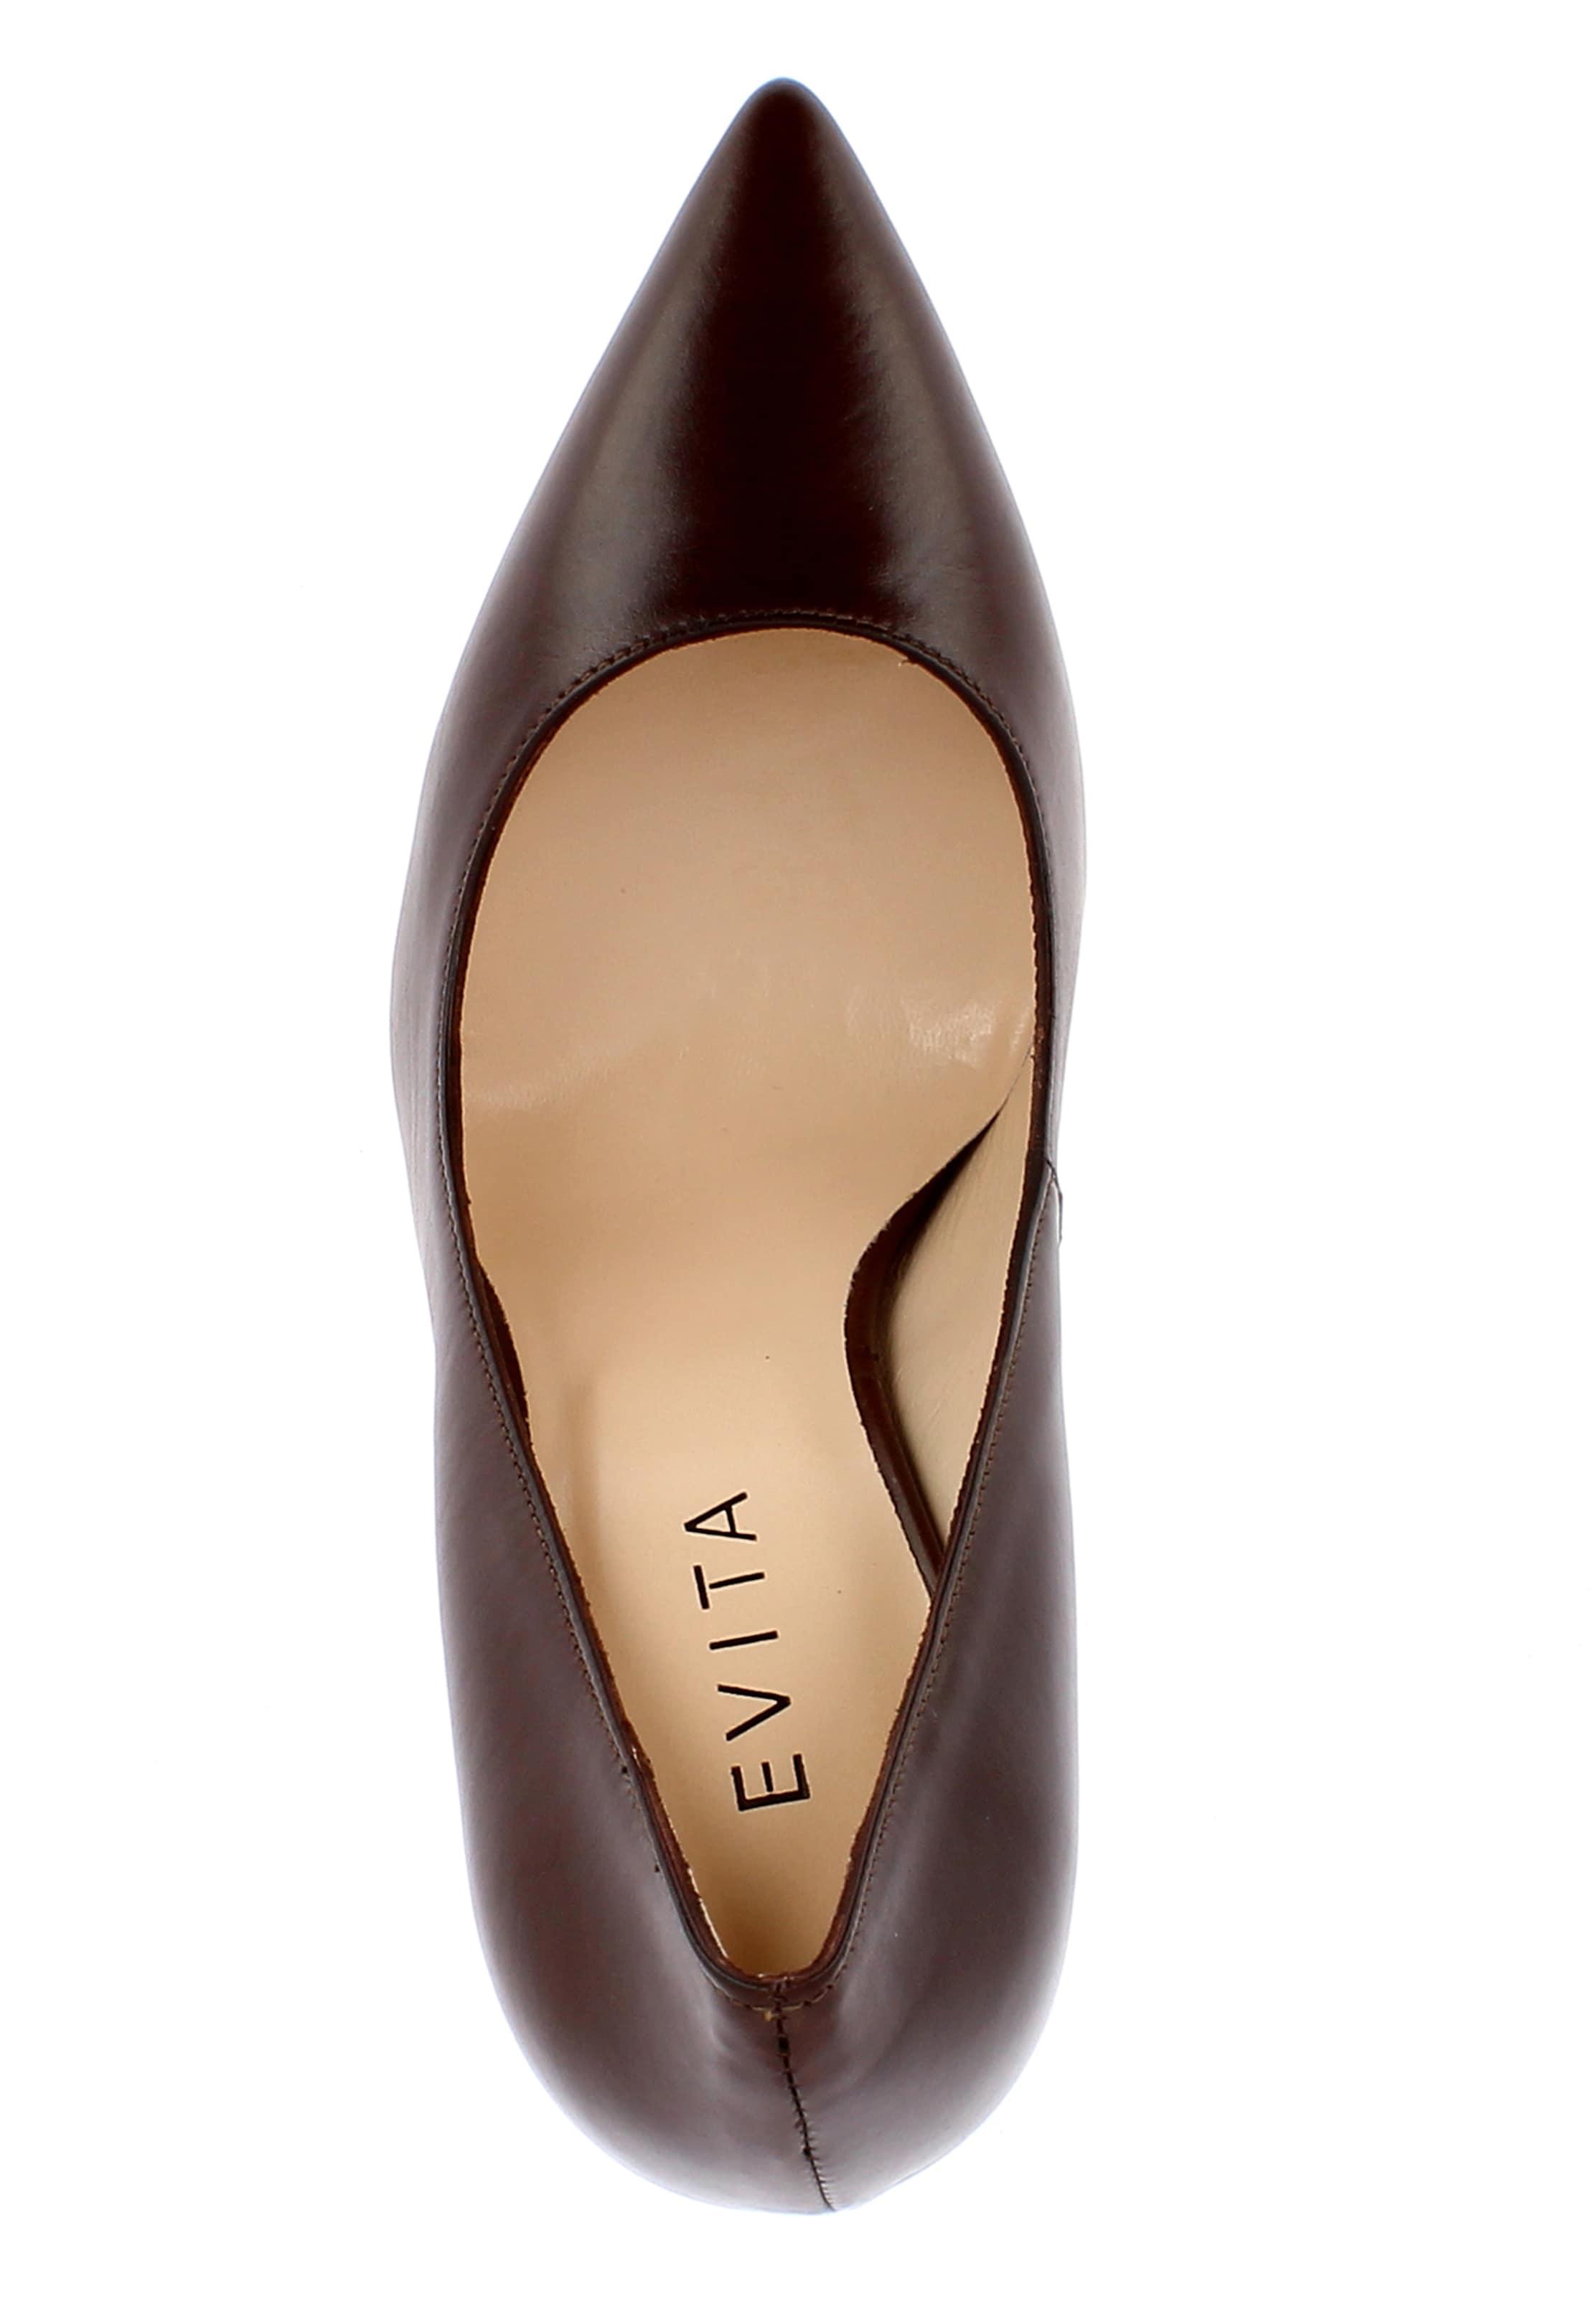 Evita Evita Pumps Kastanienbraun Pumps In In MUzVpS